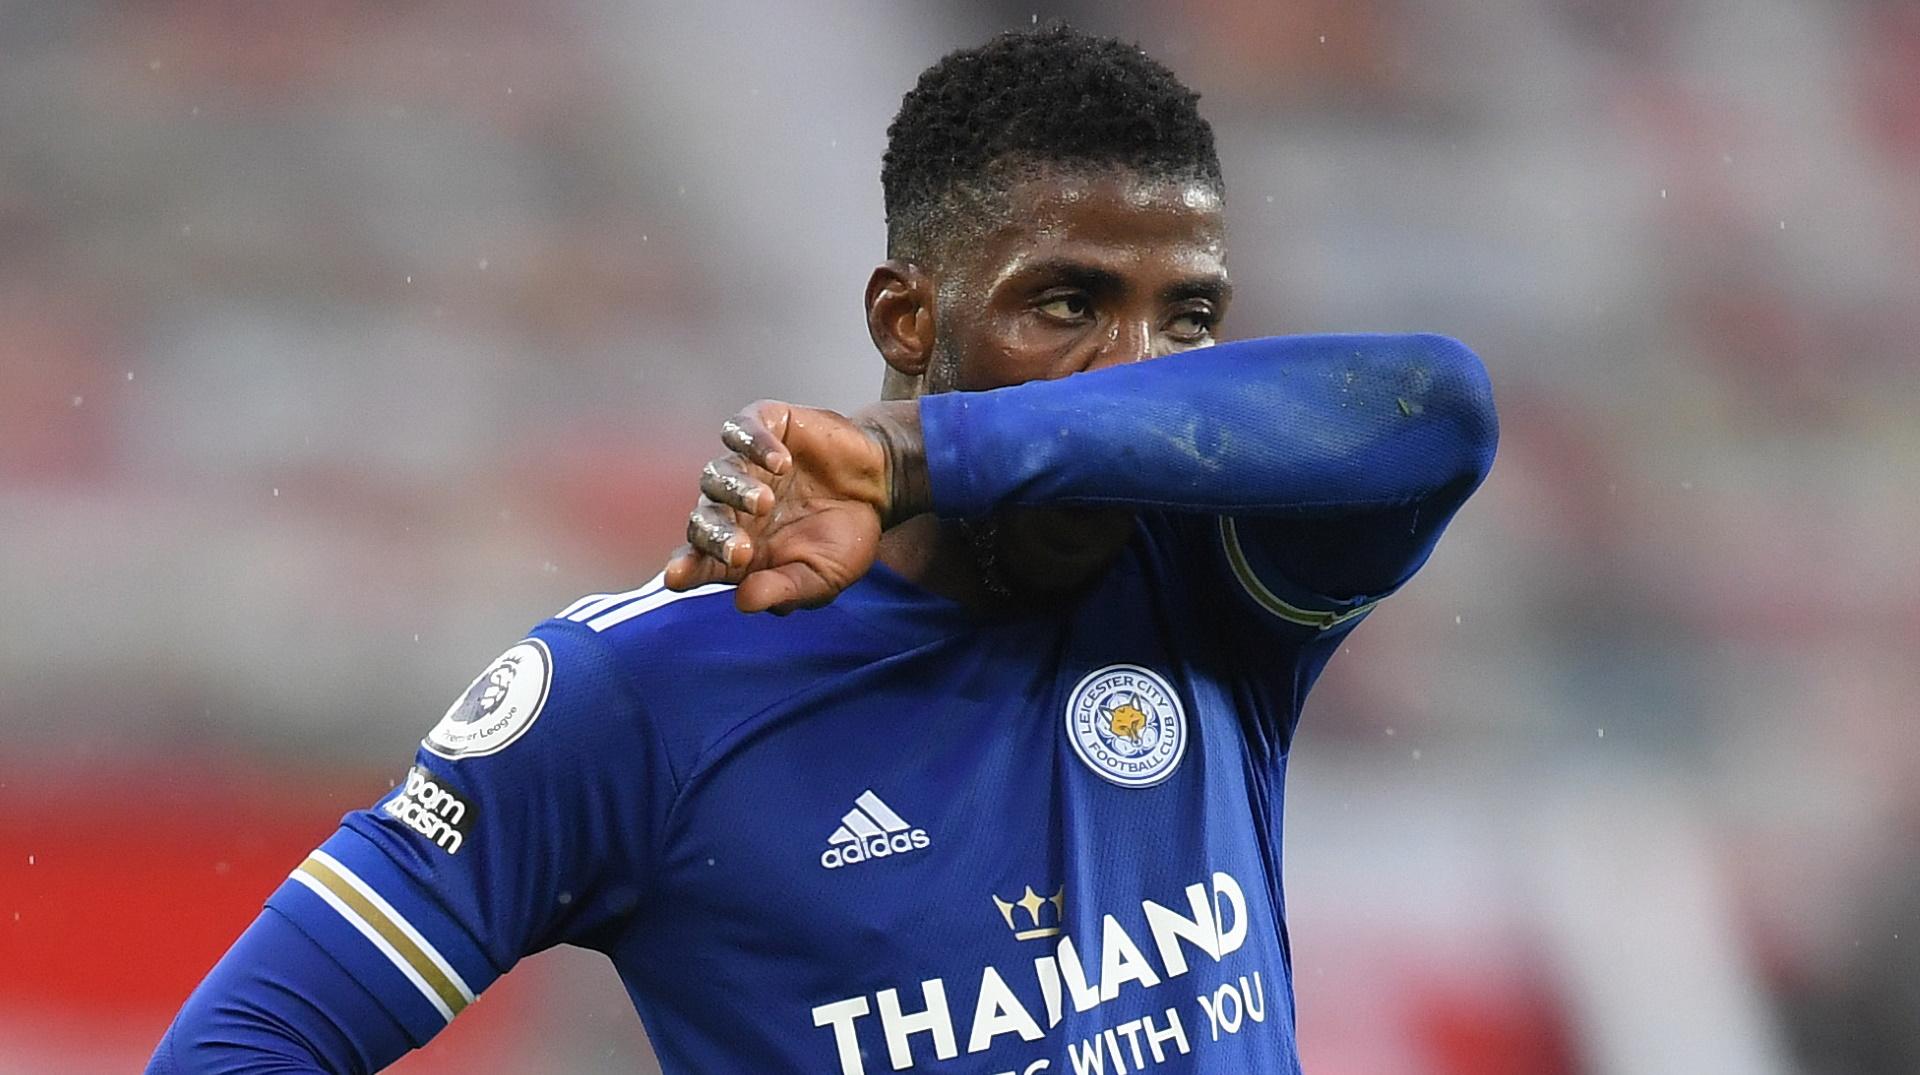 Are Iheanacho & Leicester City set for a tough season?